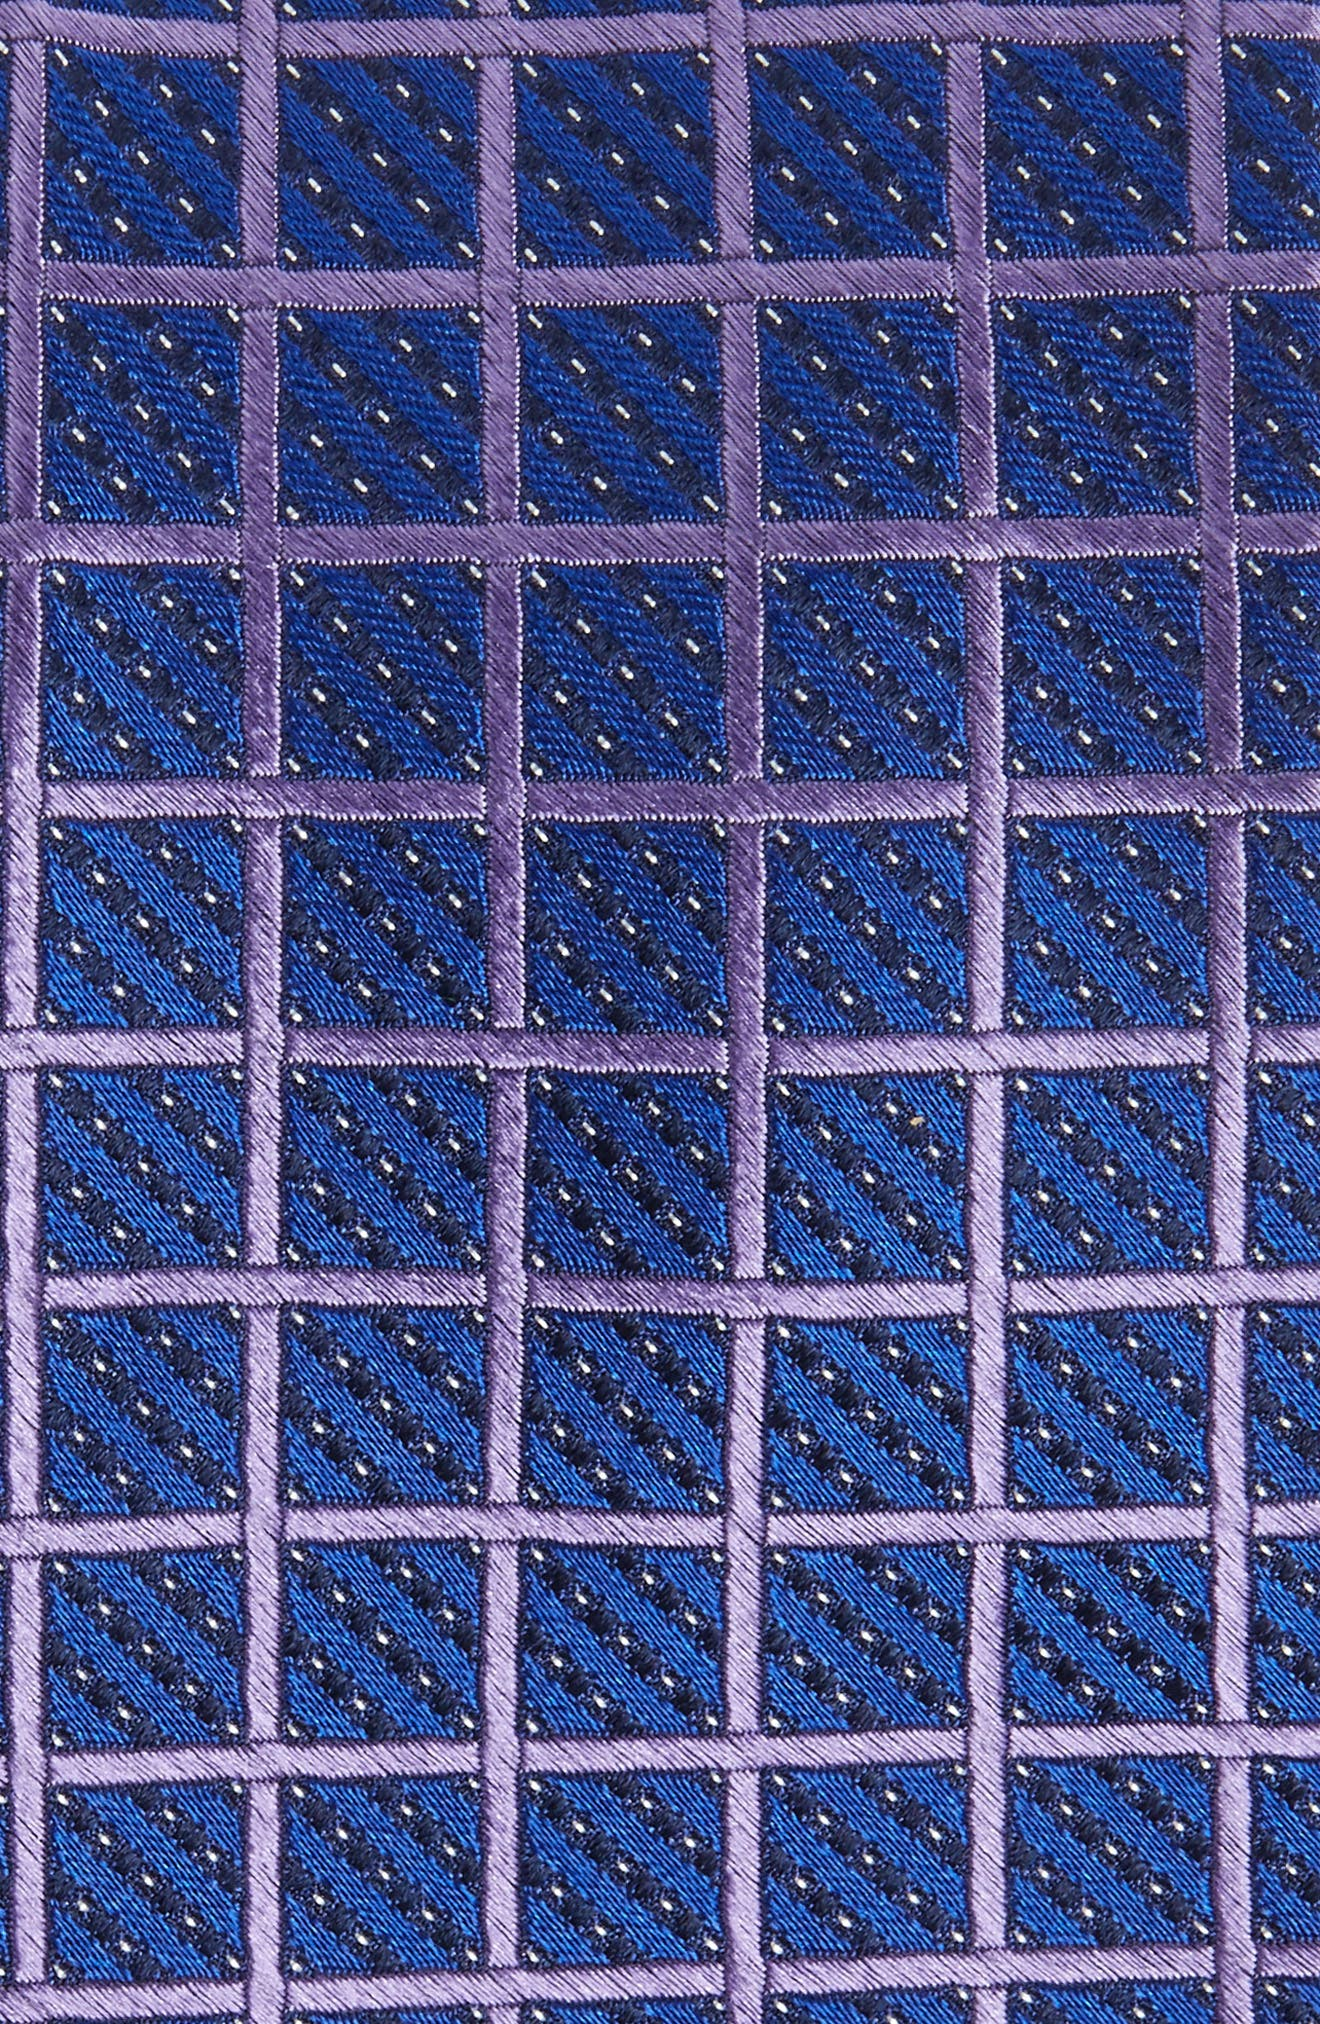 Alternate Image 2  - Nordstrom Men's Shop Tattersall Silk Tie